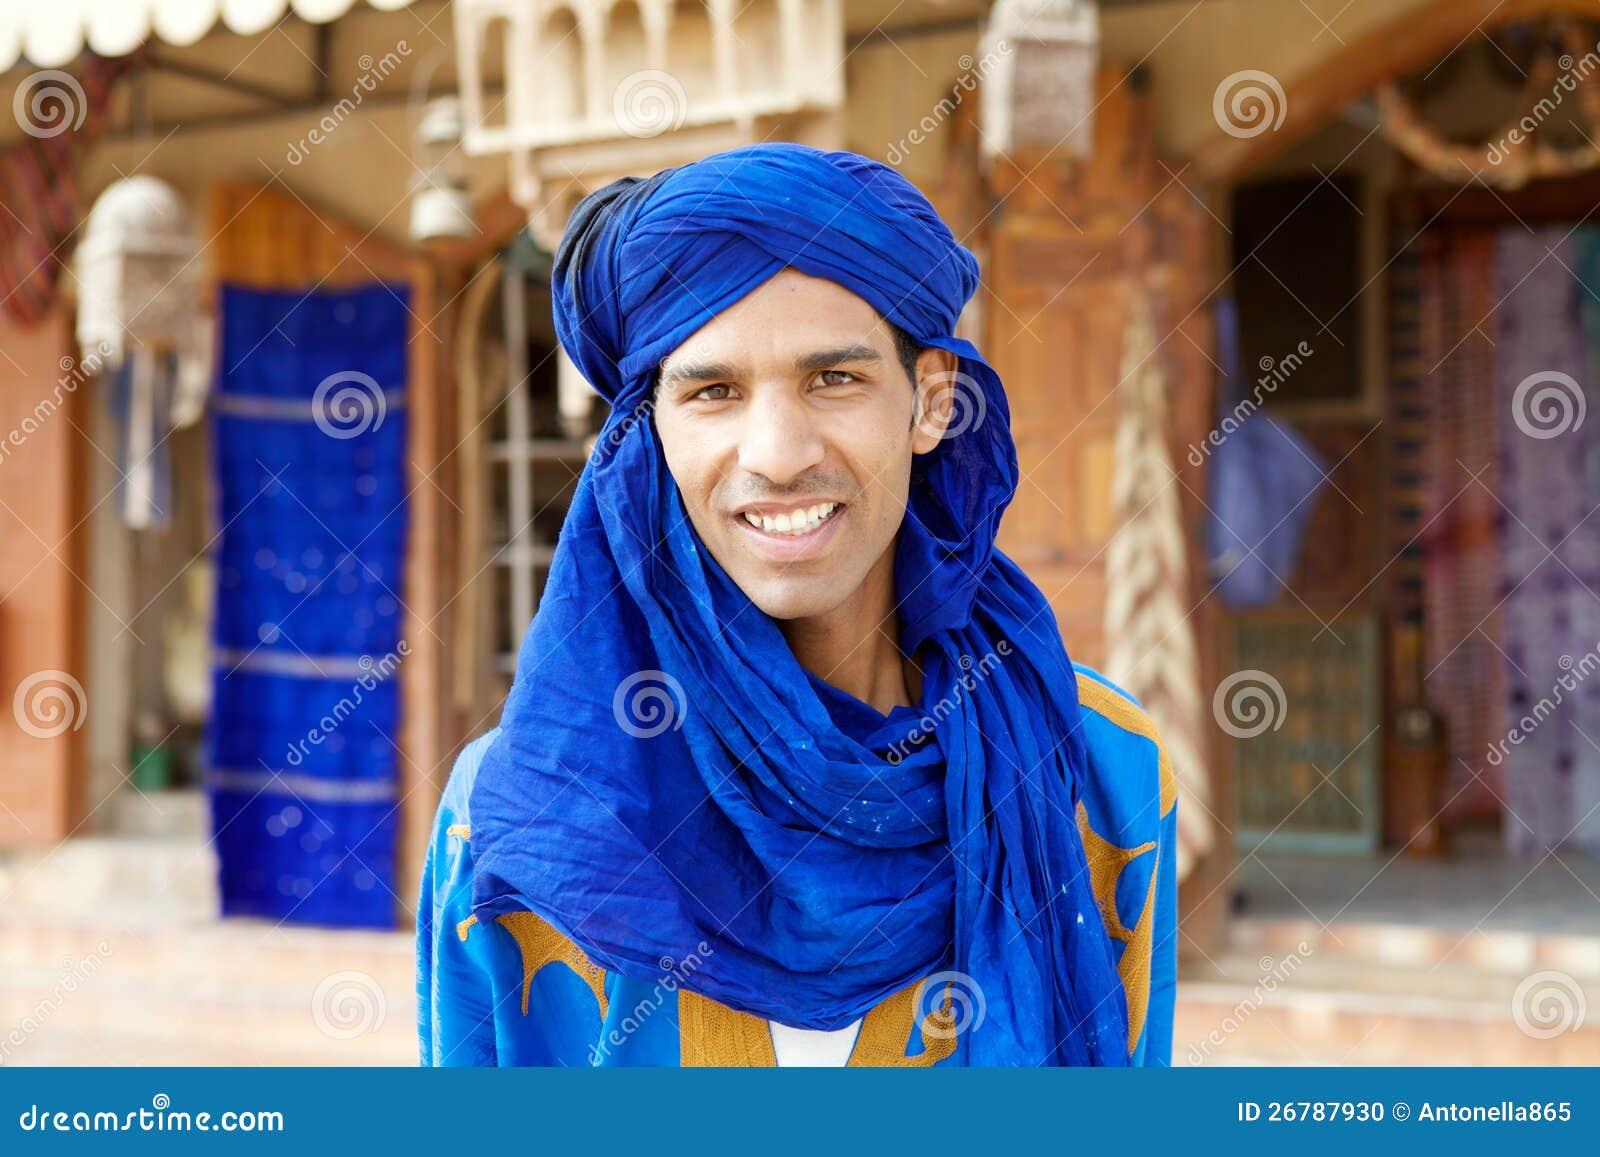 berber facial characteristics